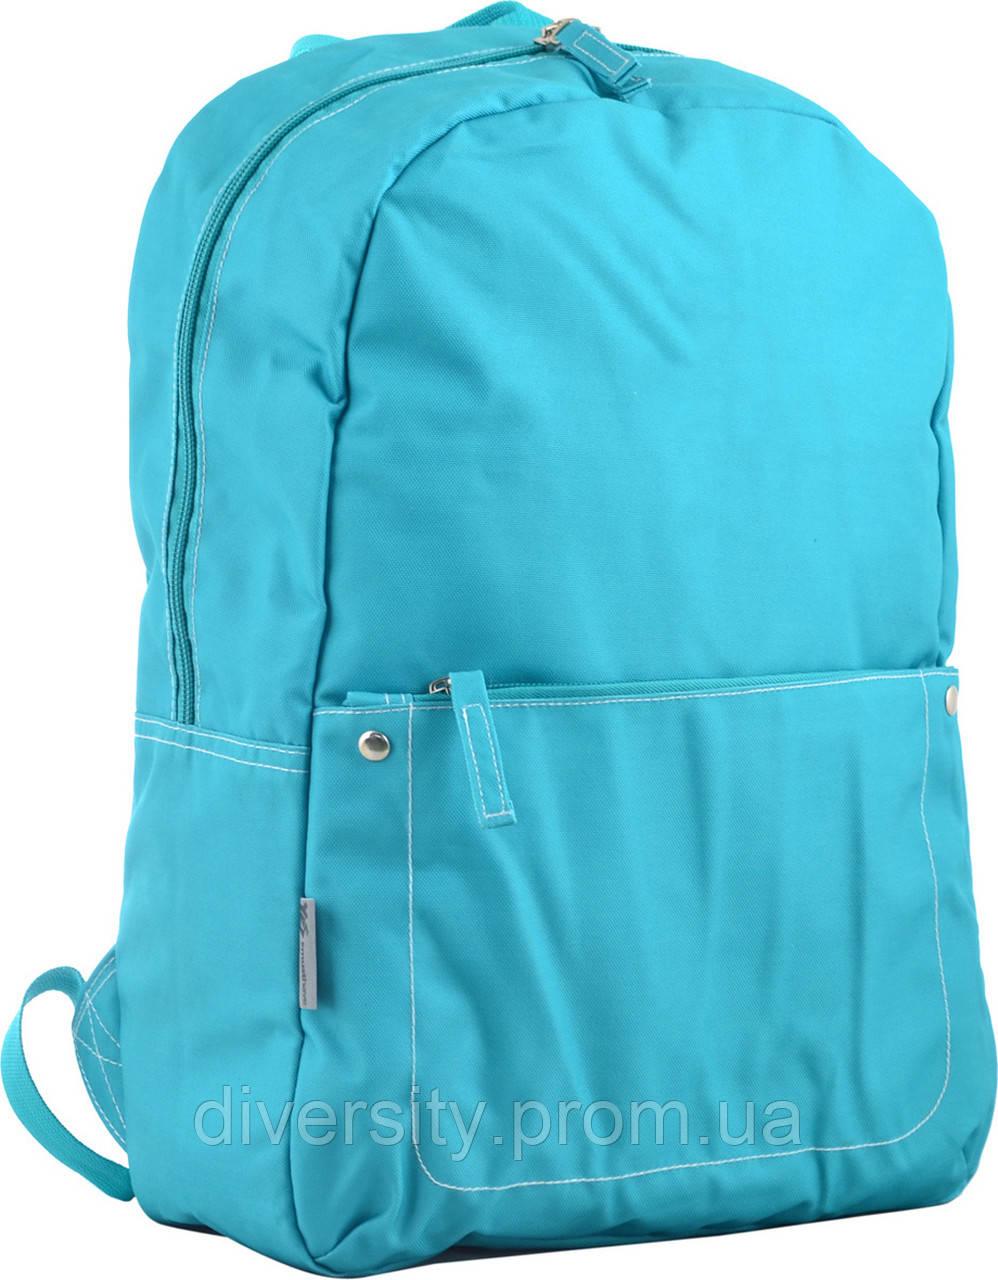 Молодежный рюкзак YES  ST-21 Sea wave, 40*26.5*12